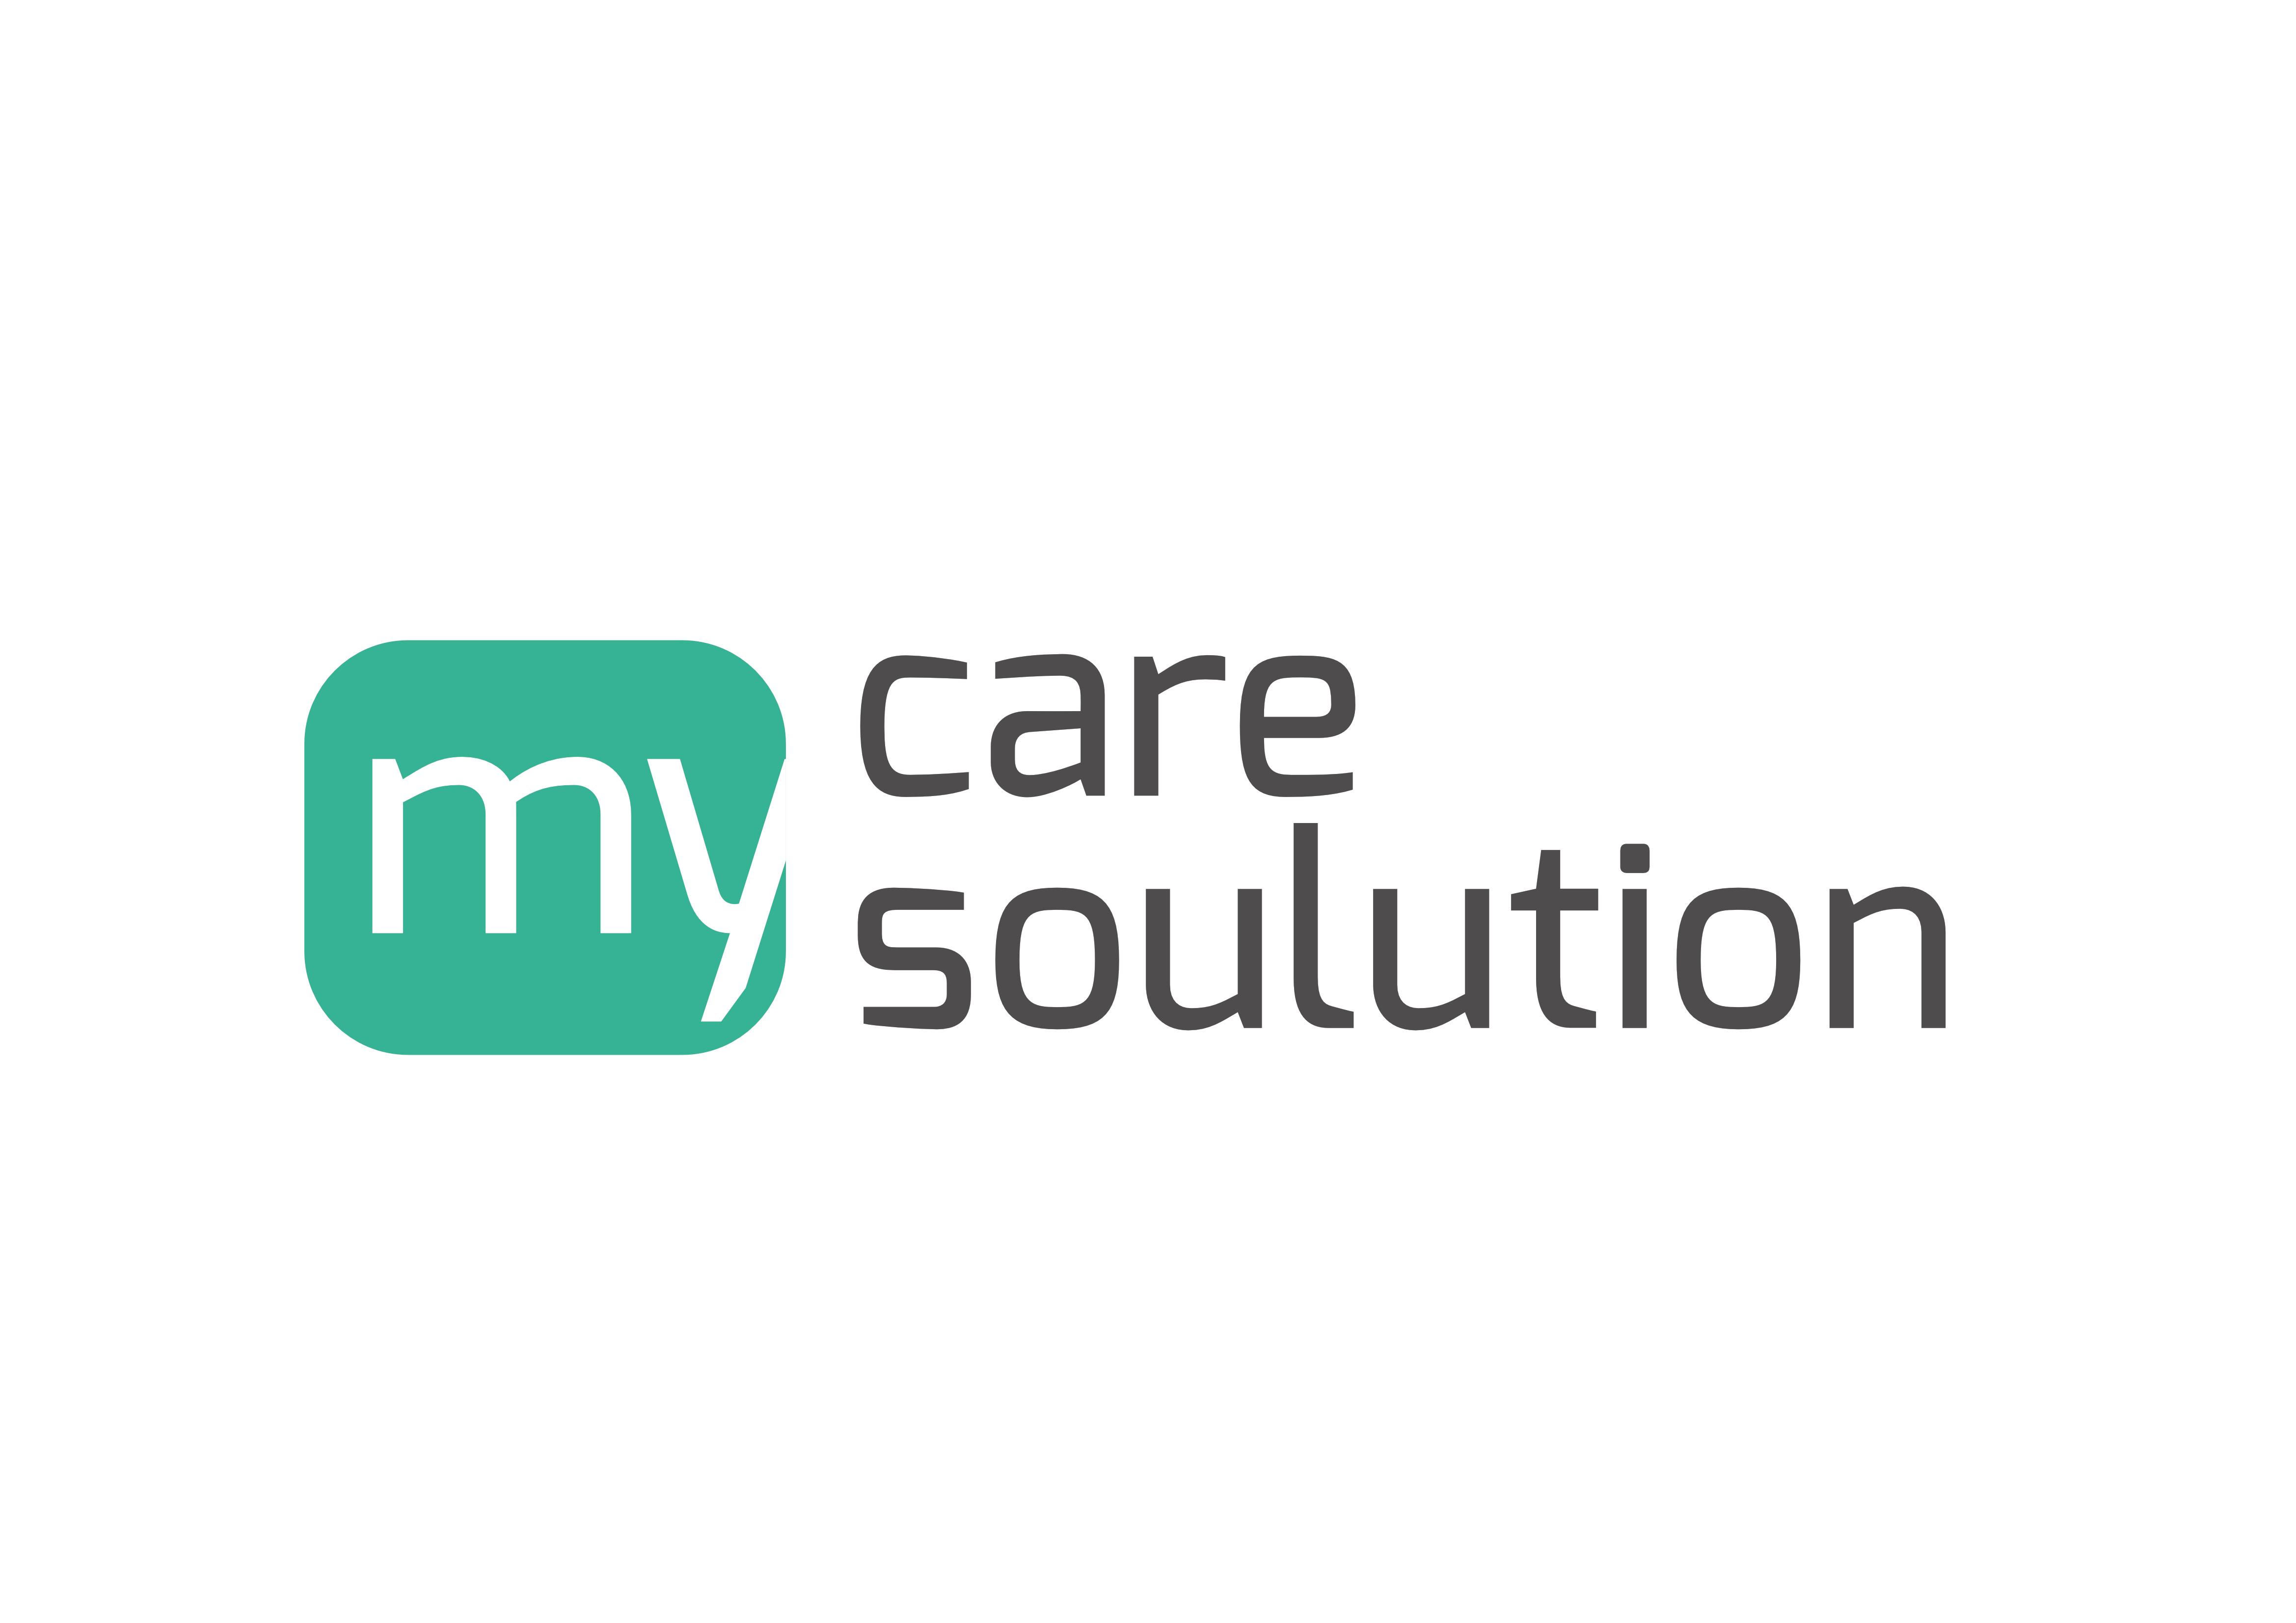 Mycaresoulutio Logo